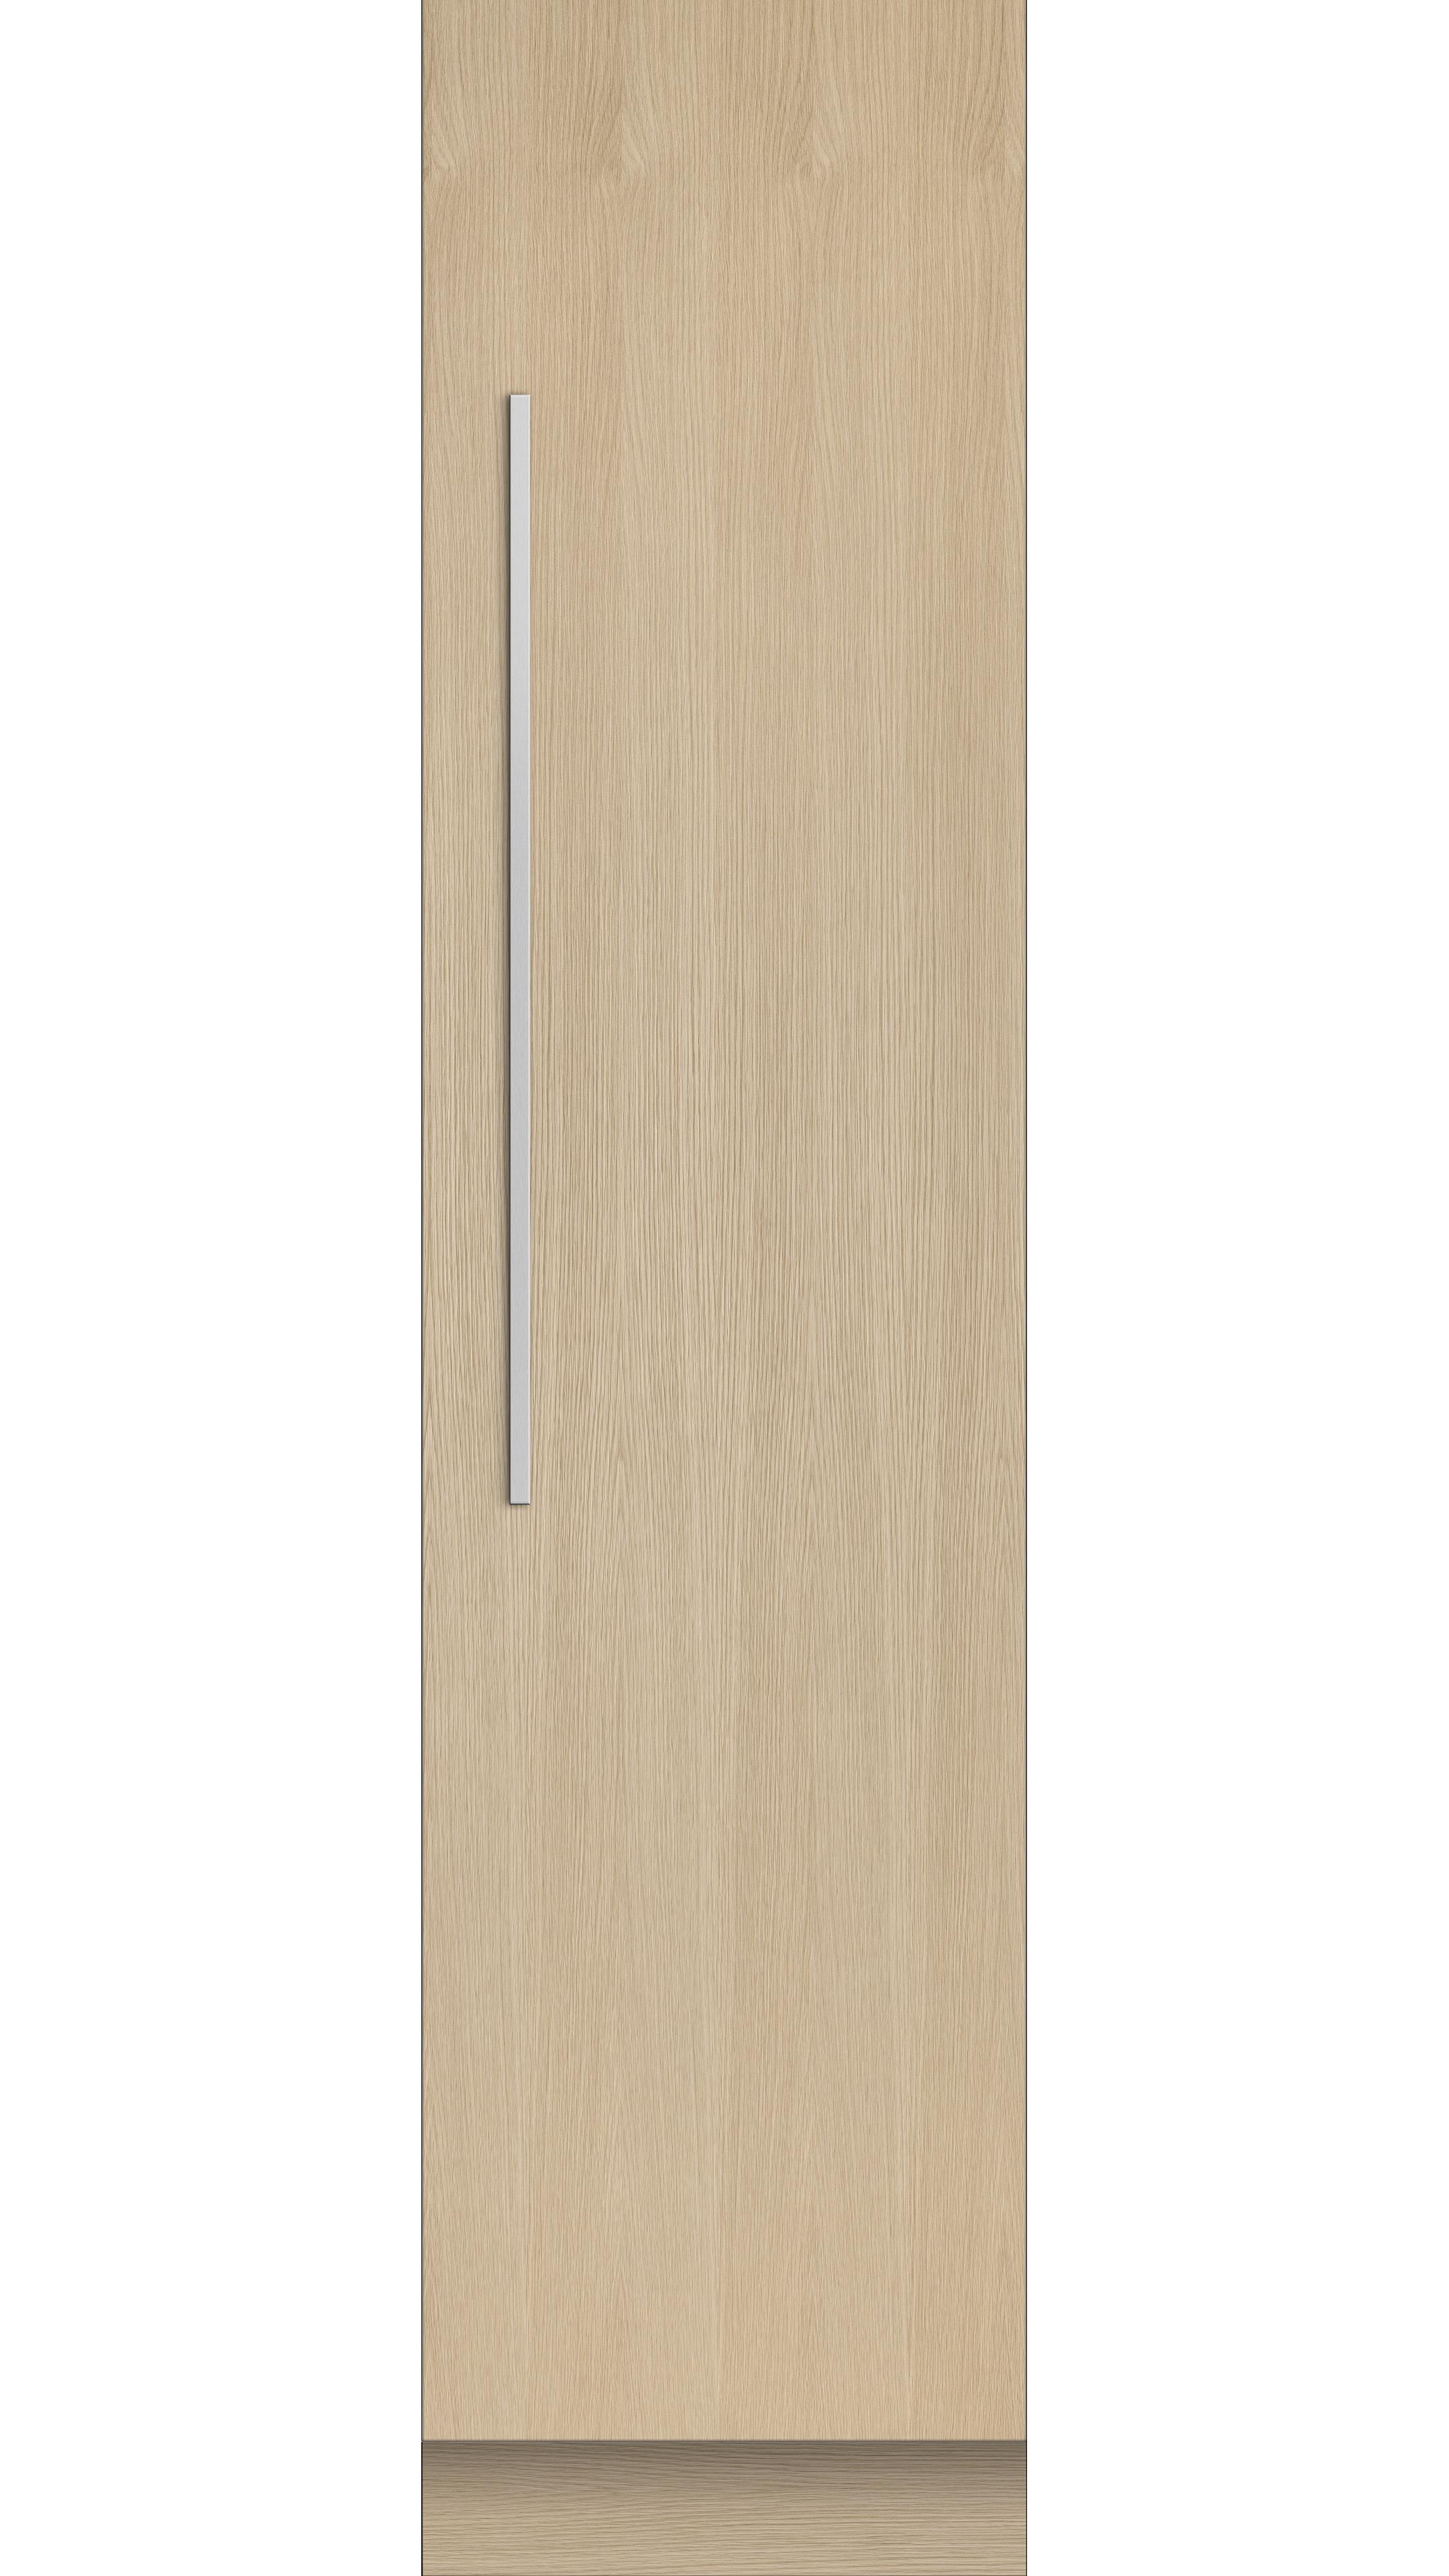 "Model: RS1884FRJK1 | Integrated Column Freezer 18"", Stainless Steel Interior"